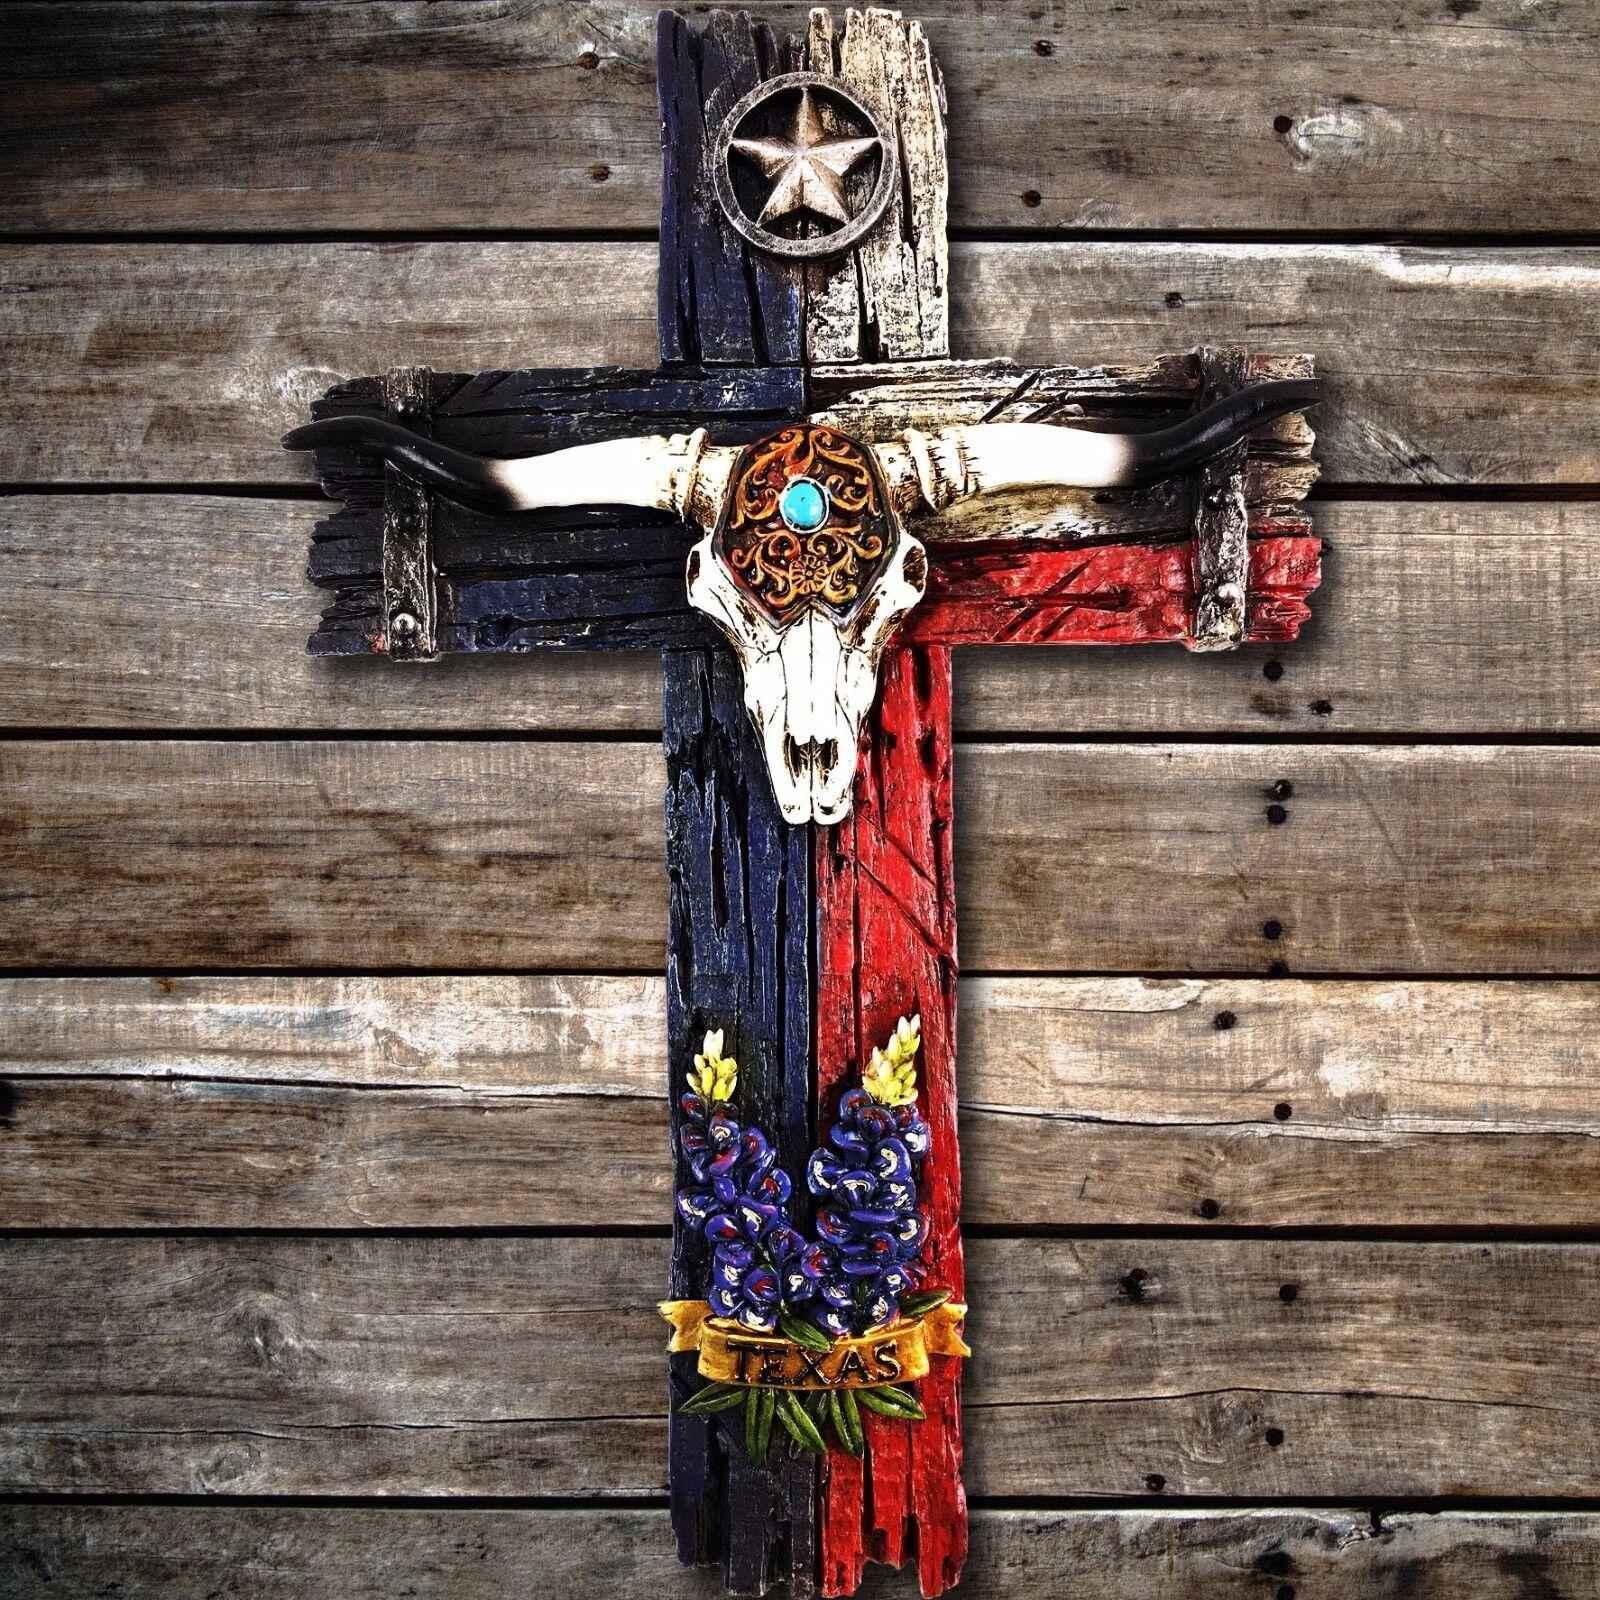 Texas Flag Turquoise Longhorn Star Bluebonnet Decorative